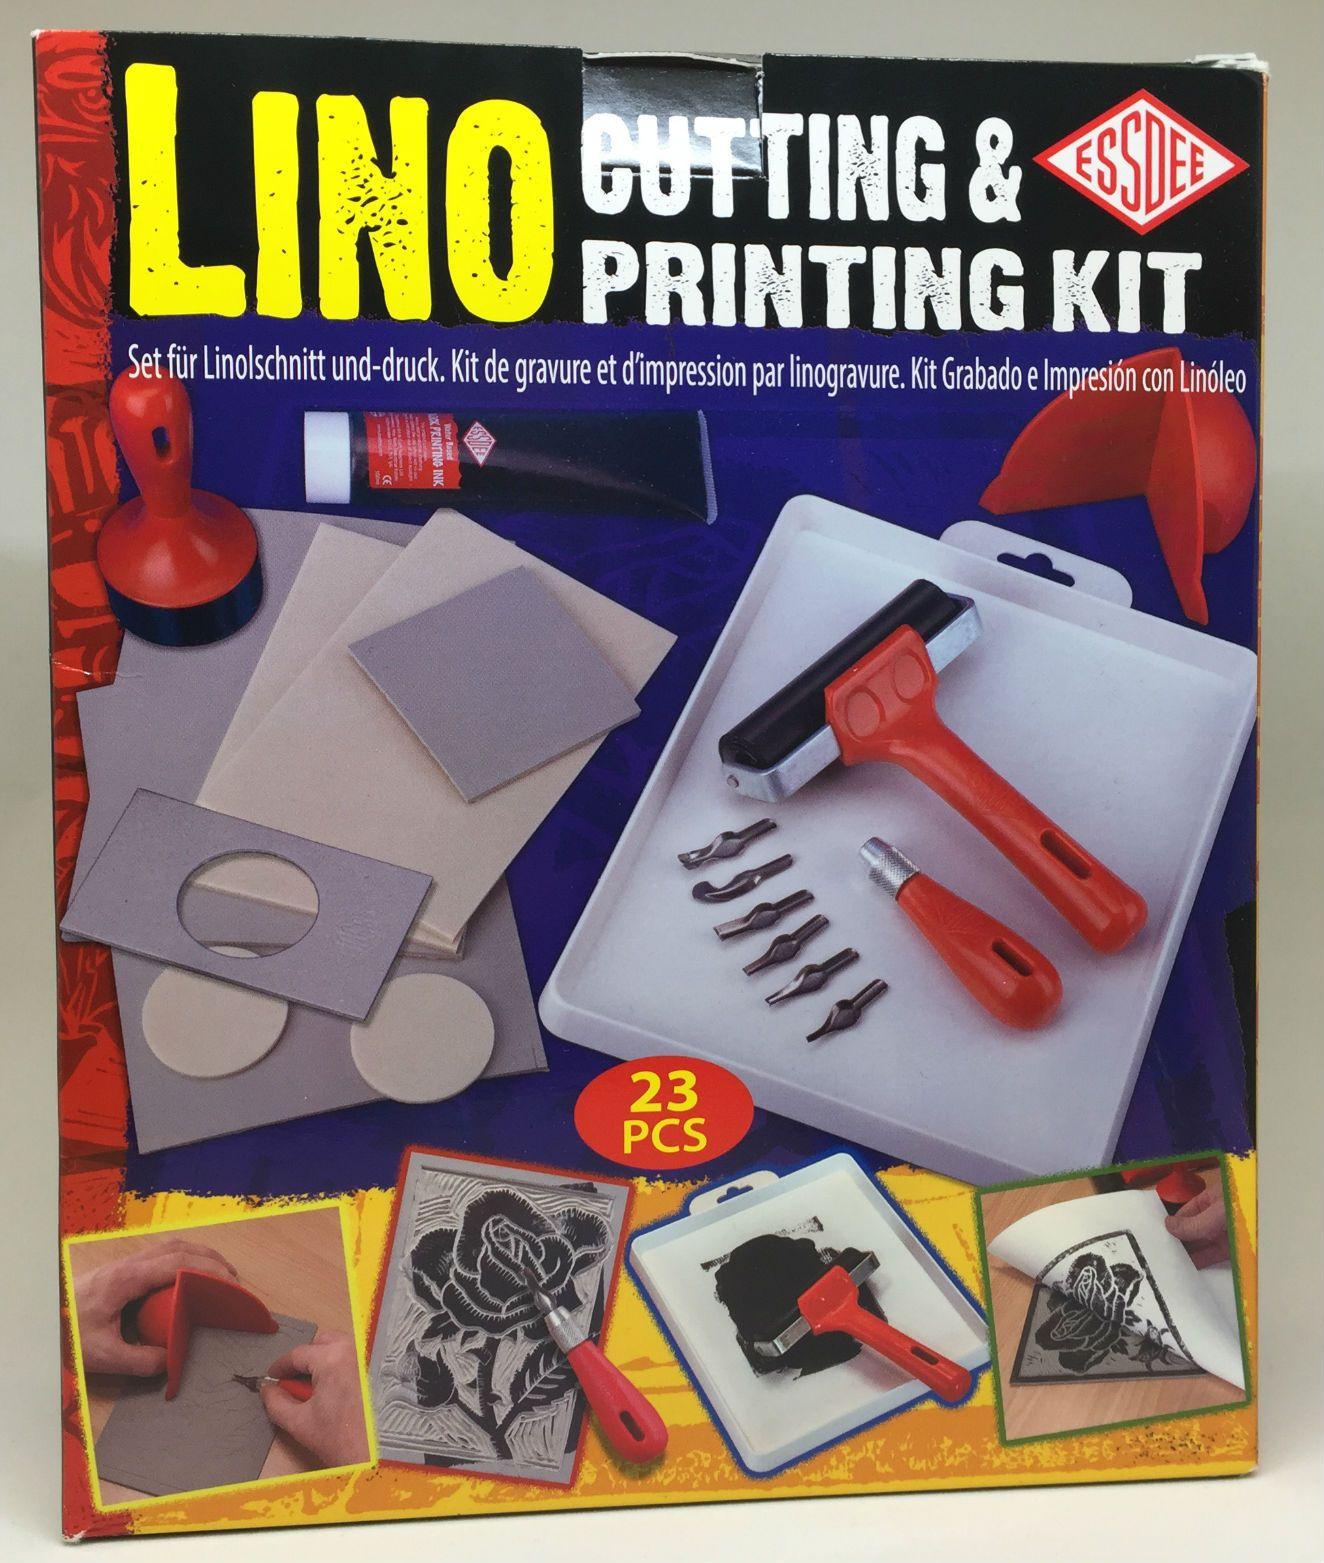 ESSDEE LINO CUTTING /& PRINTING KIT 23 PIECES SET CREATE STAMPS /& PRINTS